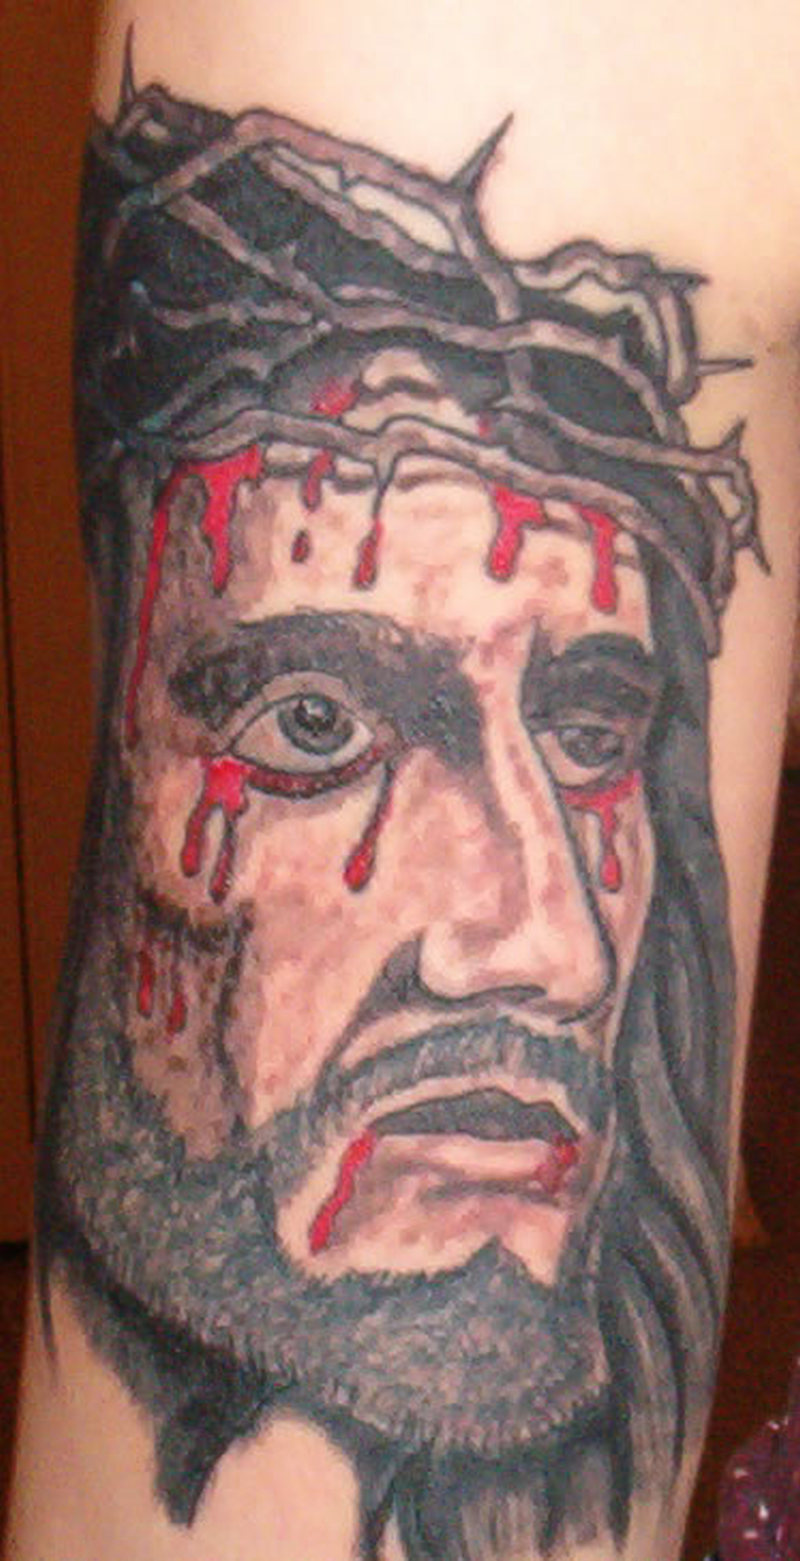 Bleeding head tattoo of jesus